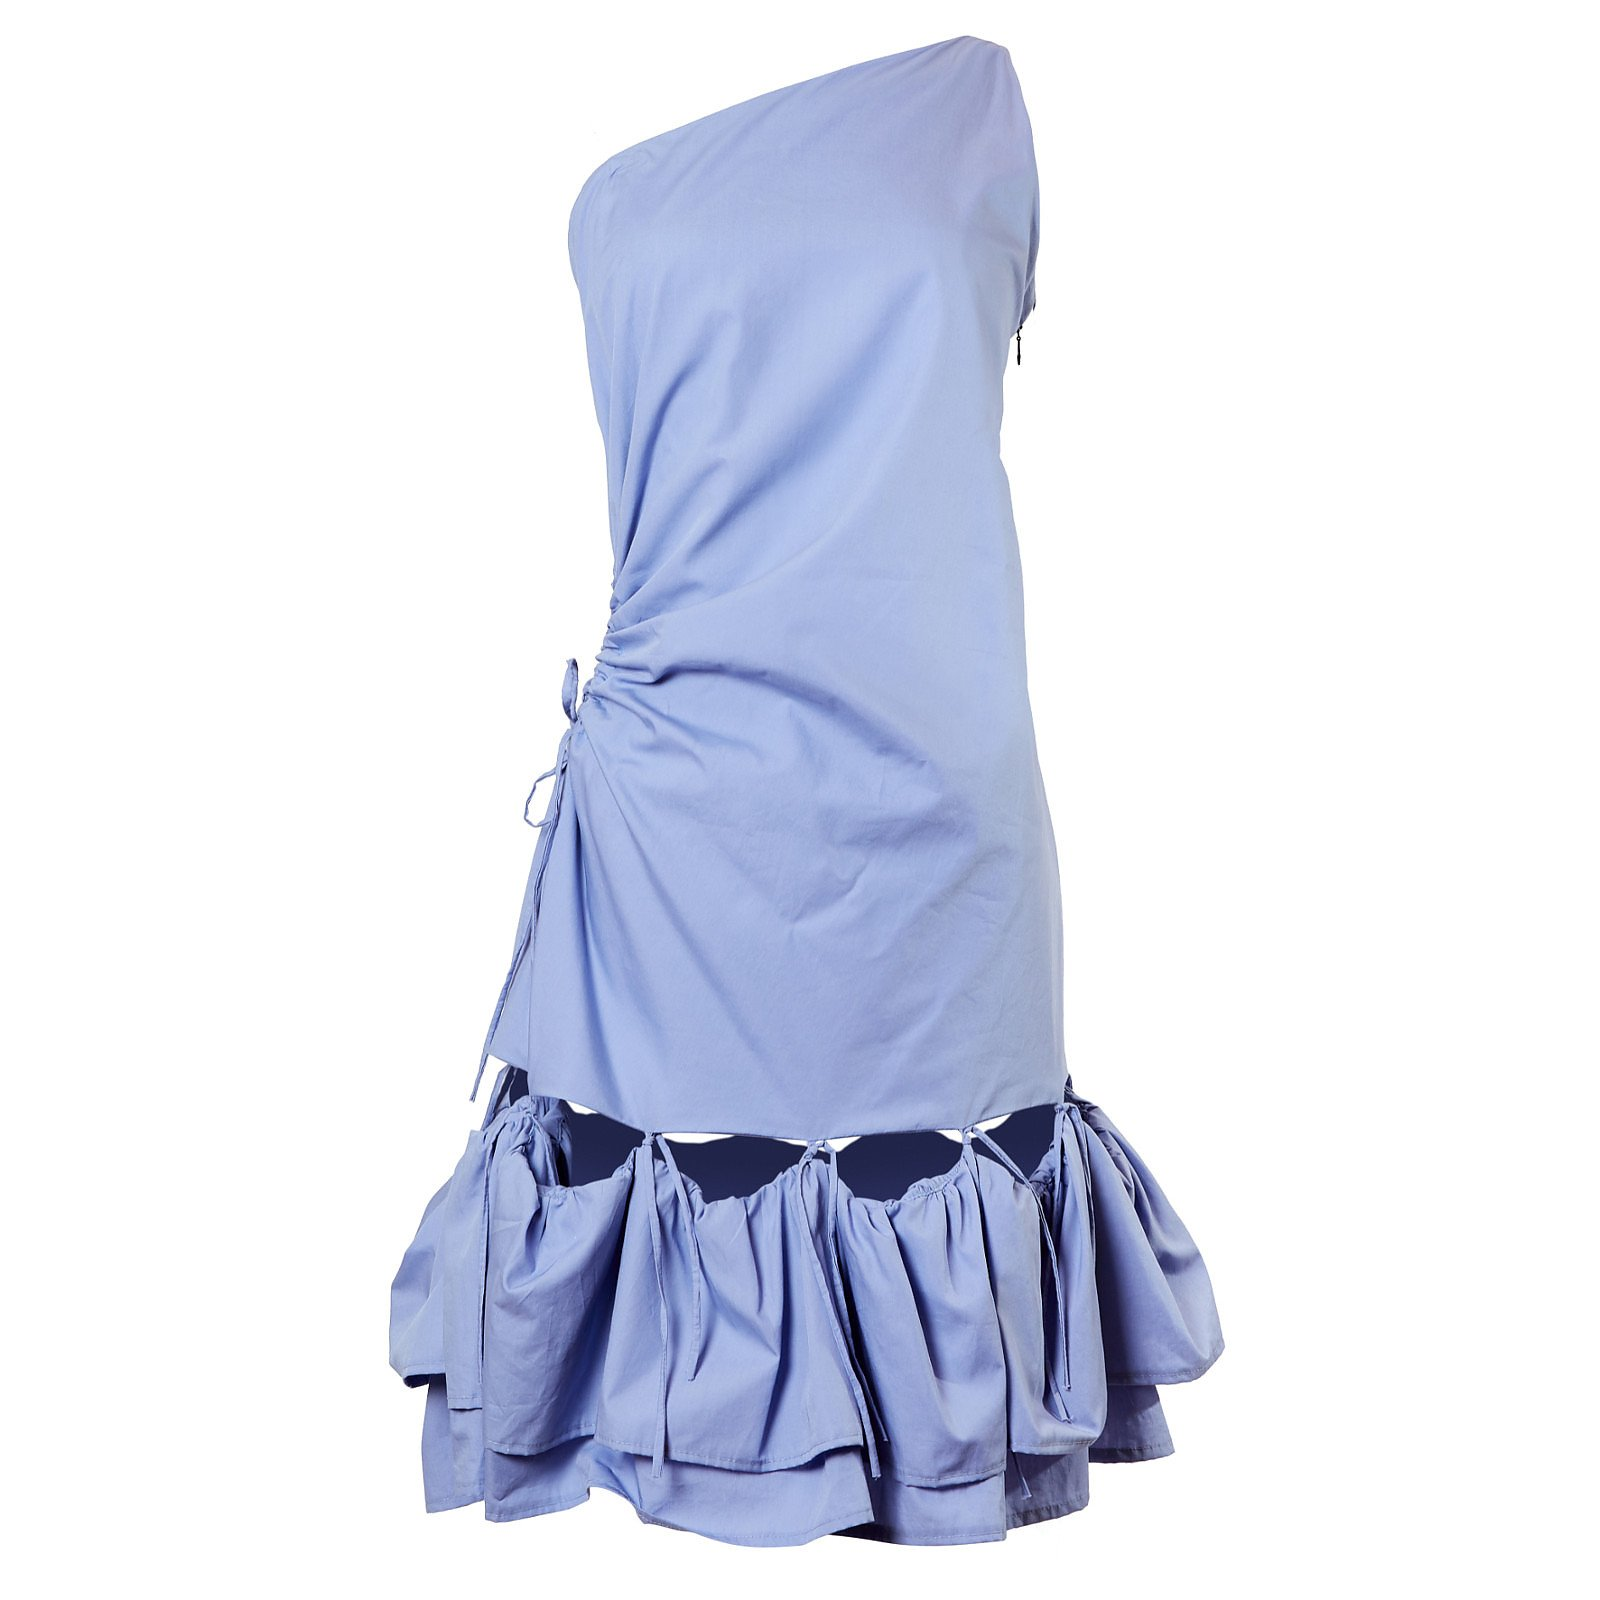 Maison Bent Single Strapped Mini Dress